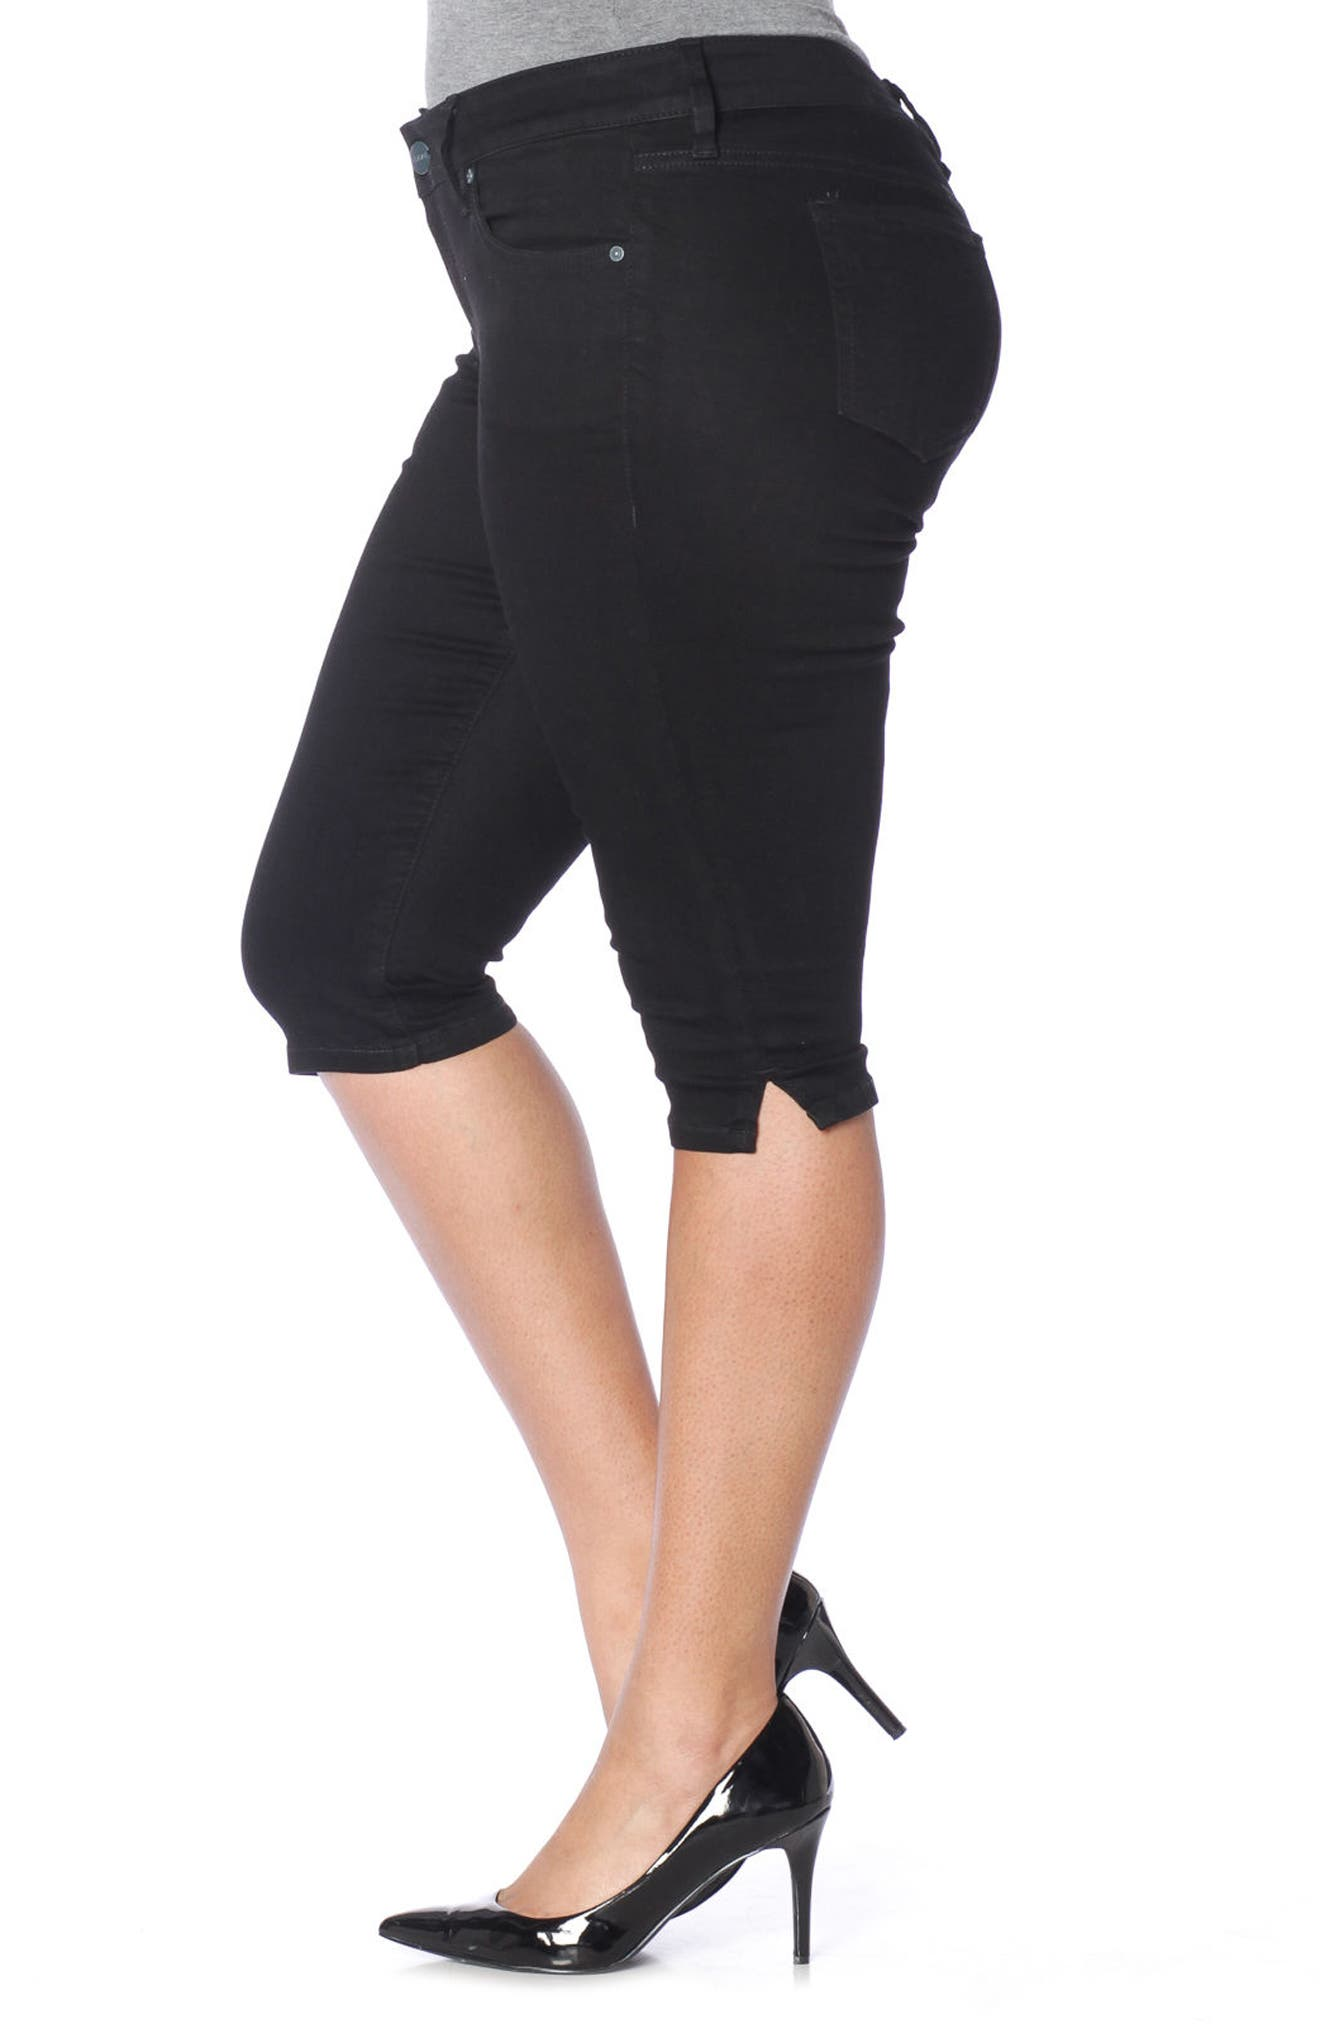 Pirate Capri Skinny Jeans,                             Alternate thumbnail 3, color,                             Black